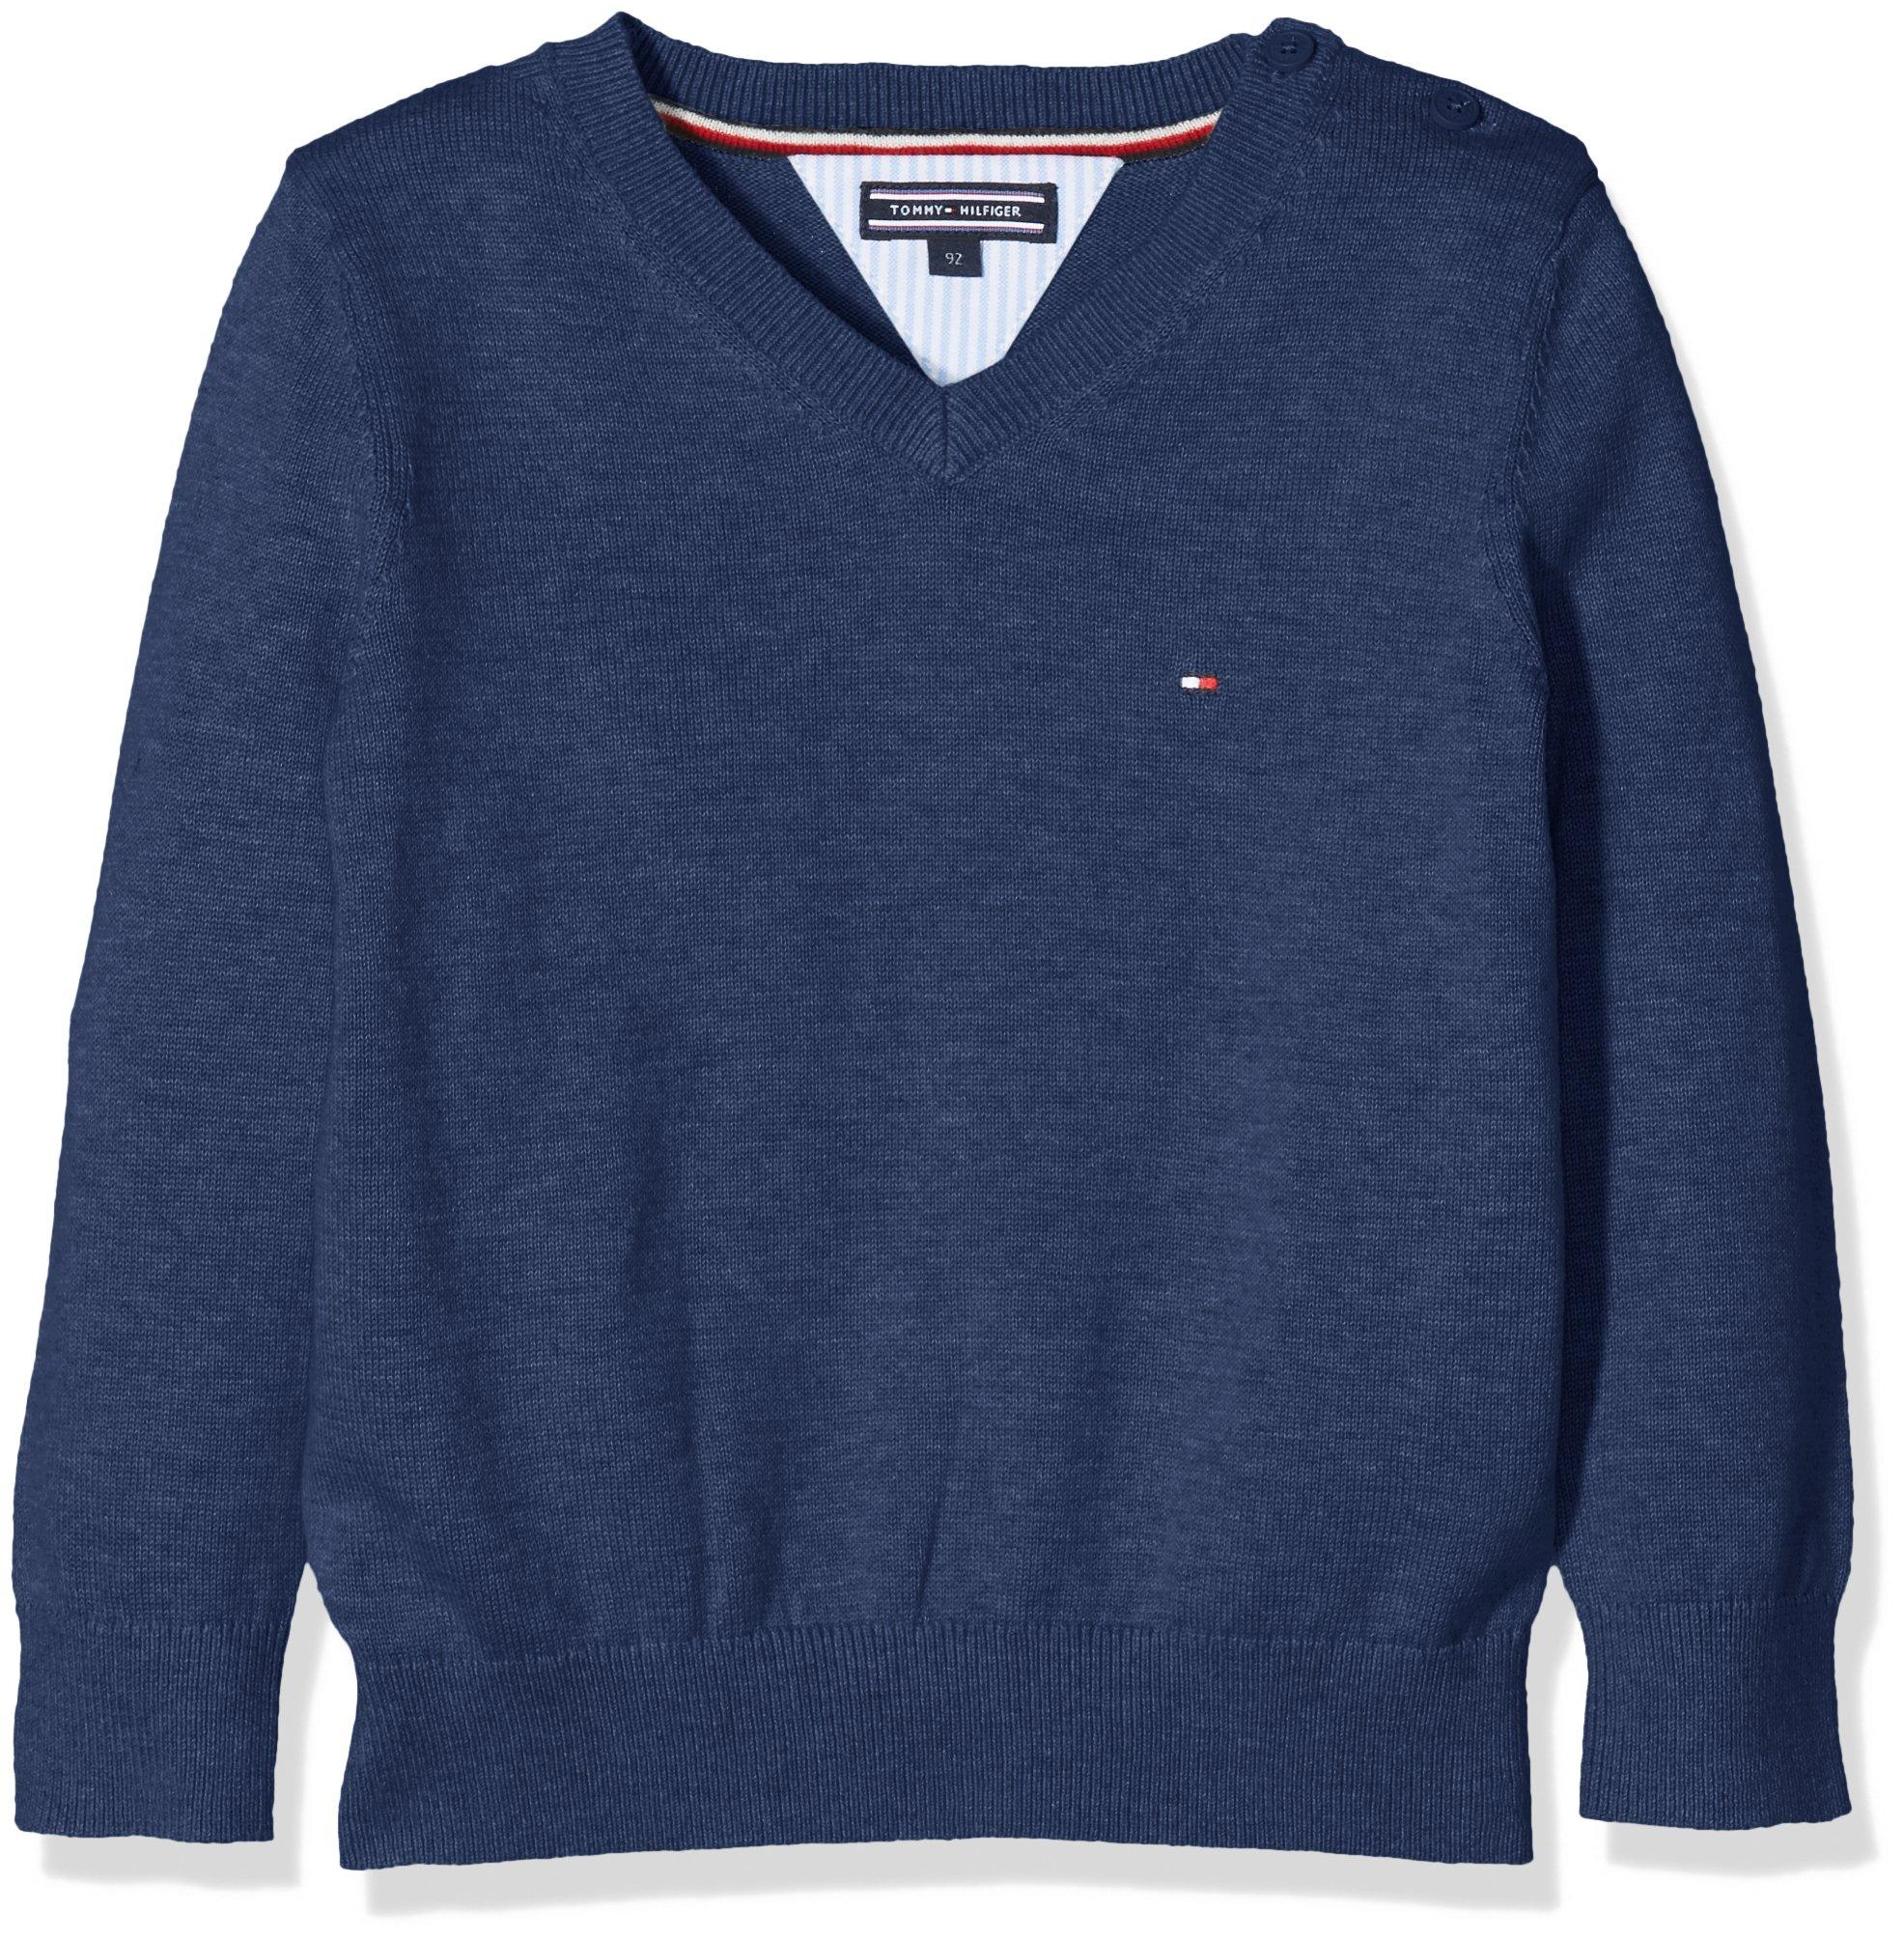 Tommy Hilfiger Ame Vn Sweater L/S suéter para Niños